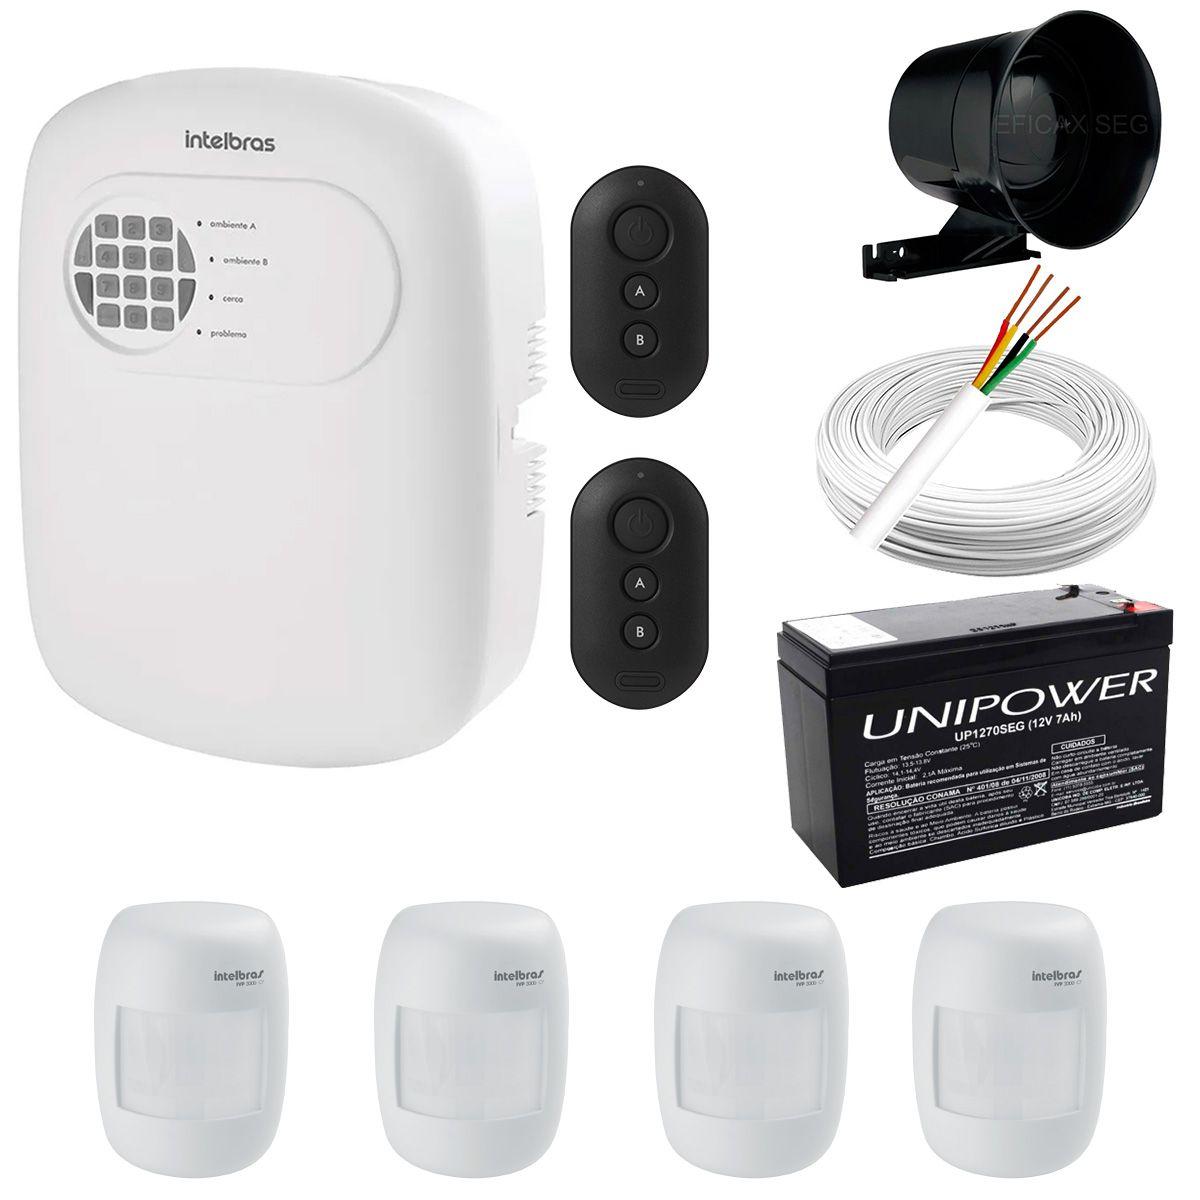 Kit de Alarme Intelbras Amt 2008 RF + 04 Sensores Com Fio Intelbras IVP 3000CF + Acessórios